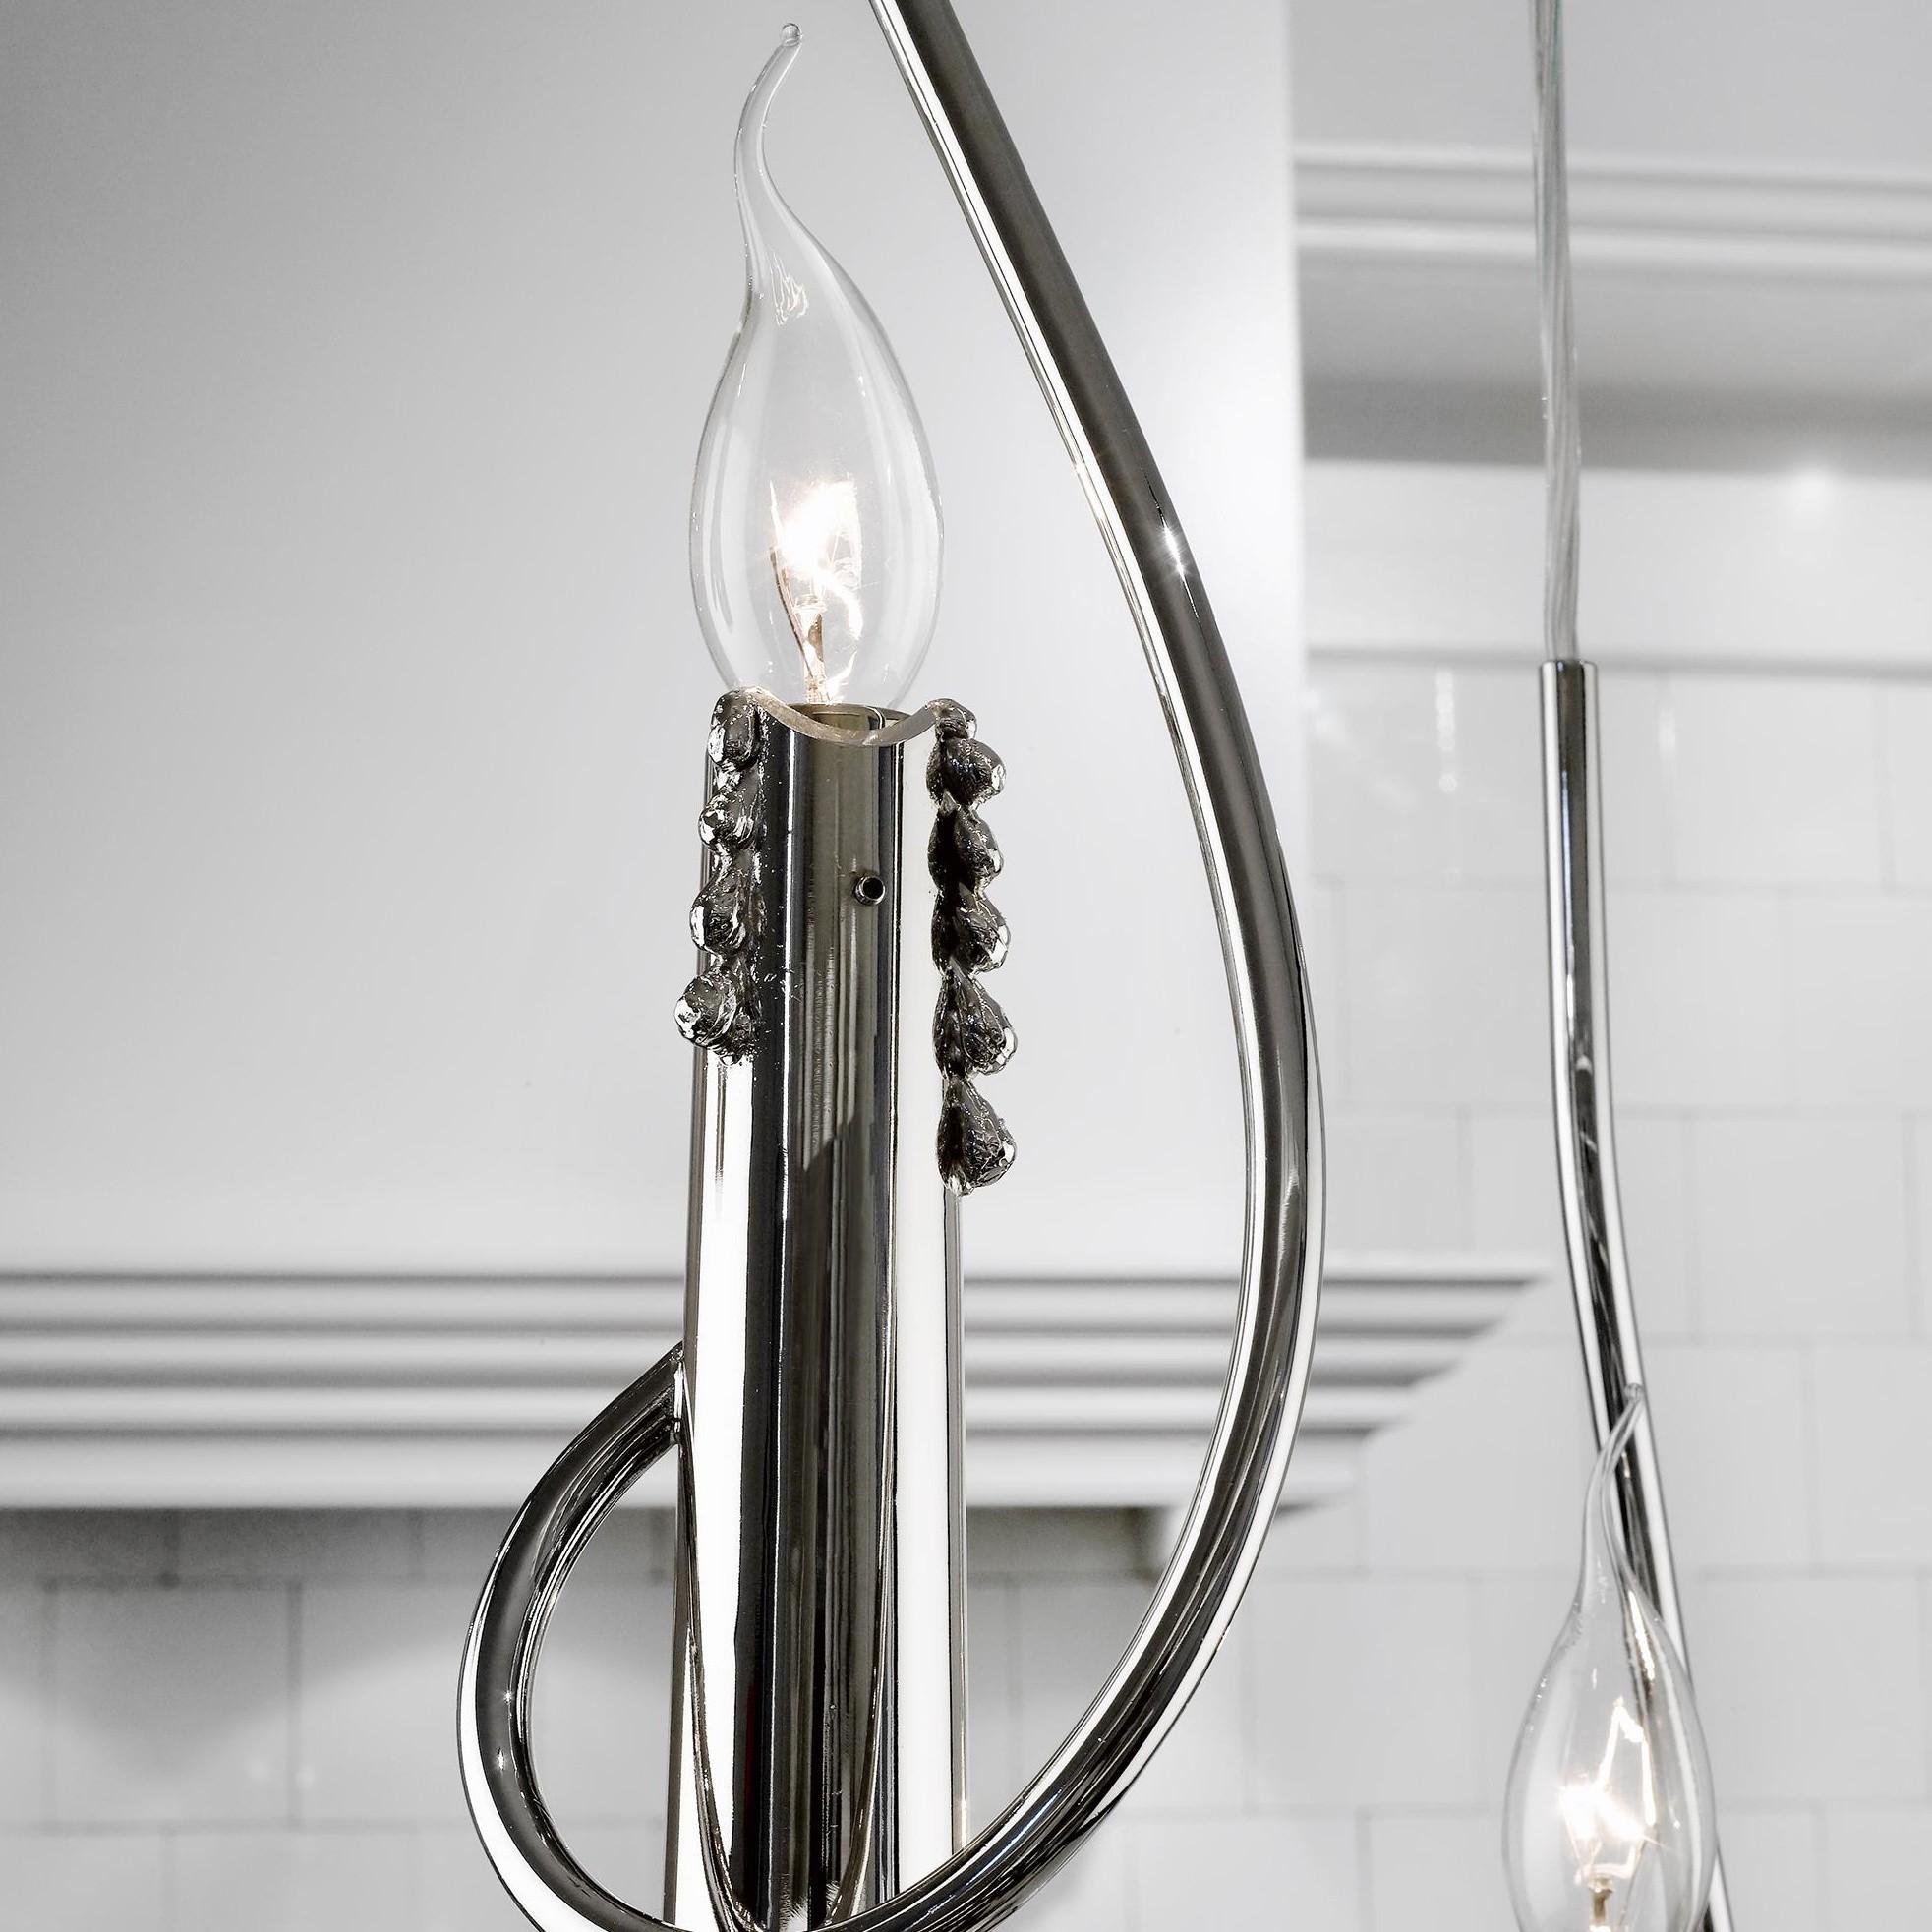 Brand Van Egmond Floating Candles.Floating Candles Suspension Lamp 1x